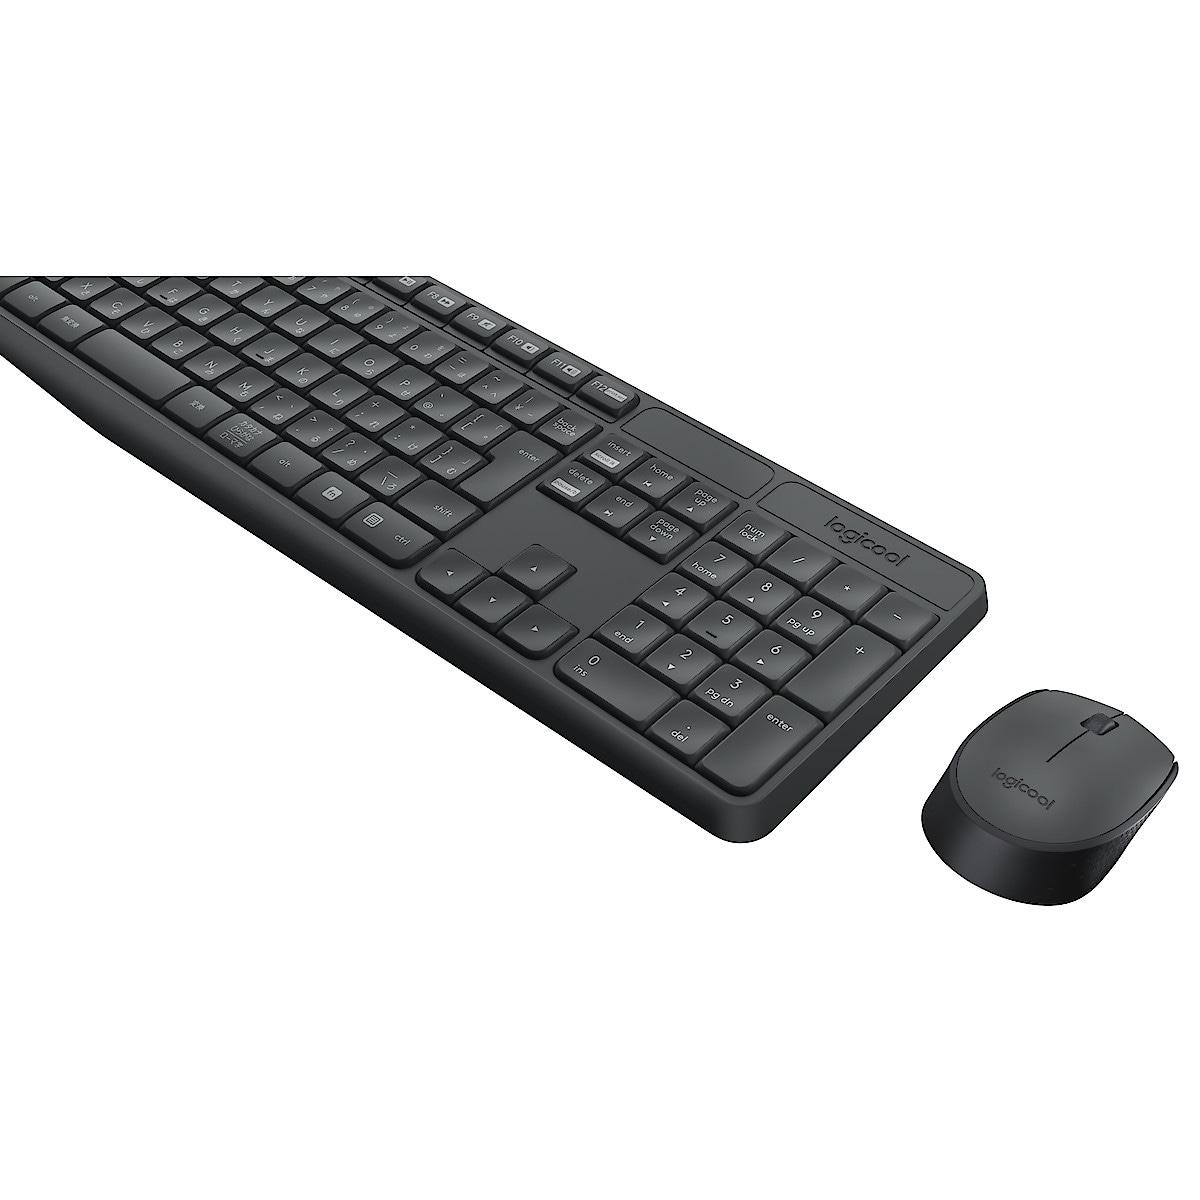 Trådløst tastatur og mus | Clas Ohlson